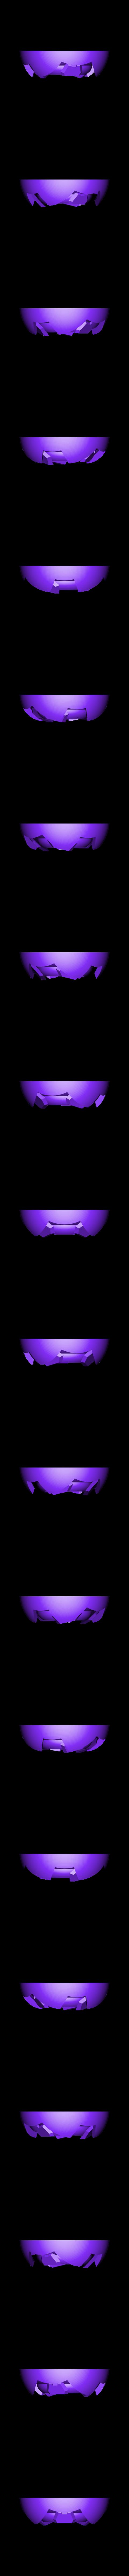 Eye.stl Download STL file Hammond's Wrecking Ball Mech from Overwatch • 3D printer template, FunbieStudios